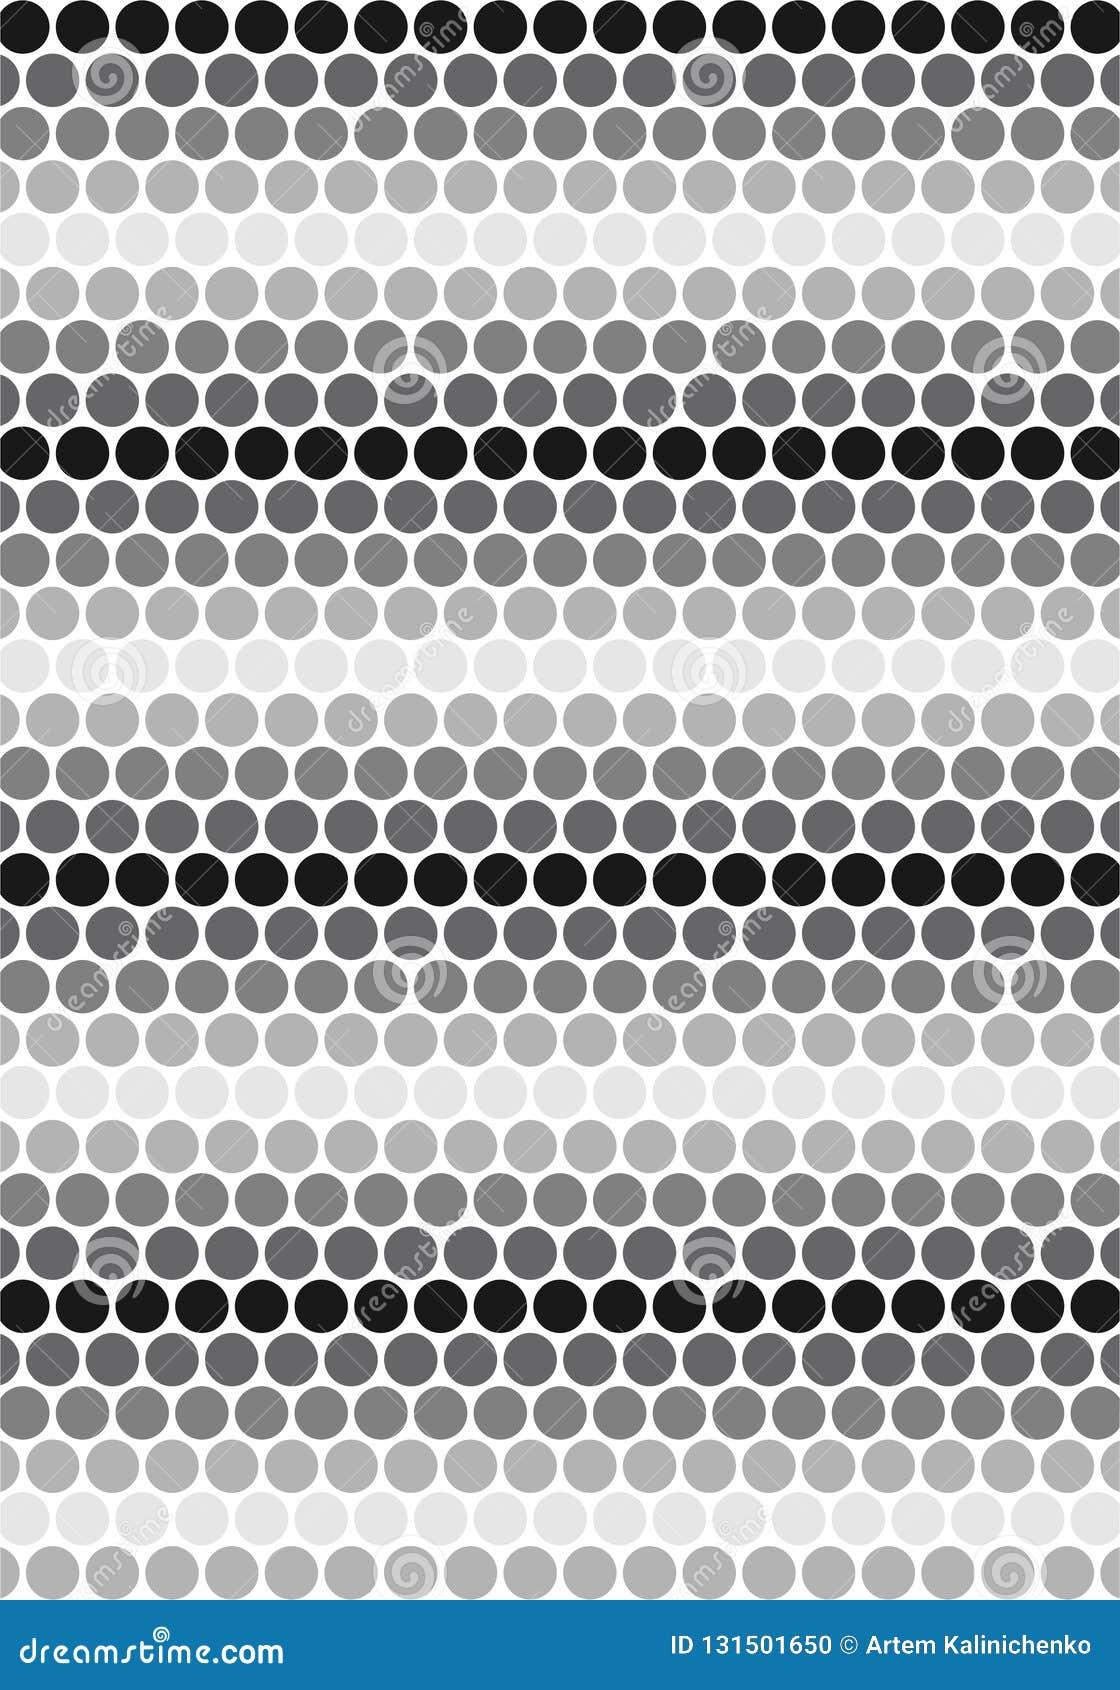 Black & White Circles pattern